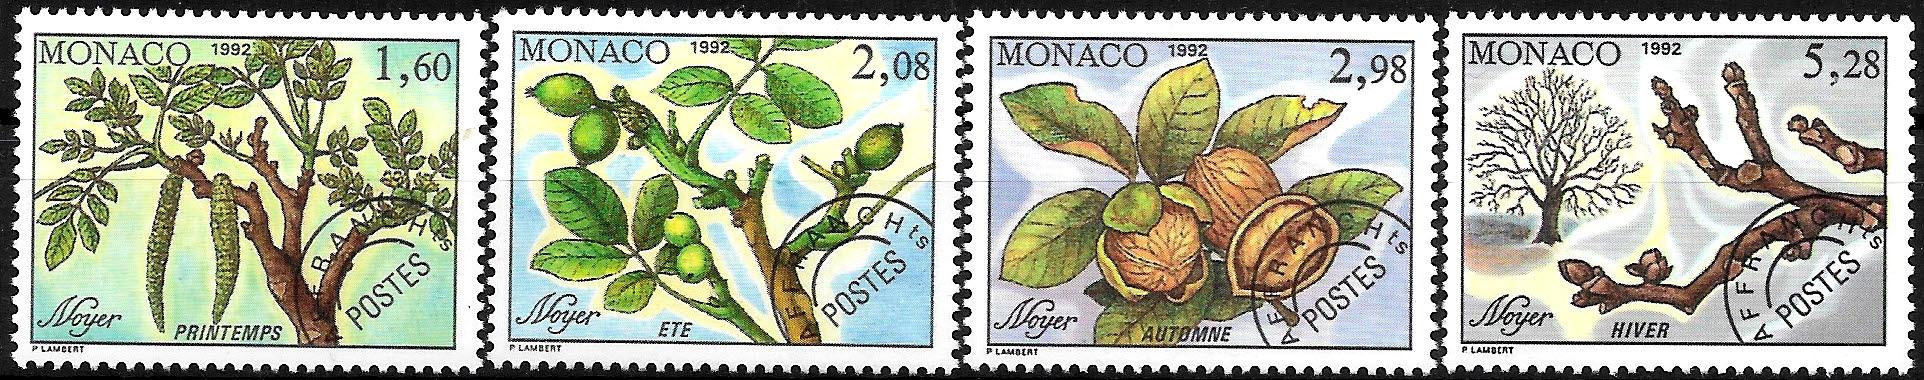 FL908 1992 FLORA drzewa, owoce zn.** Monako